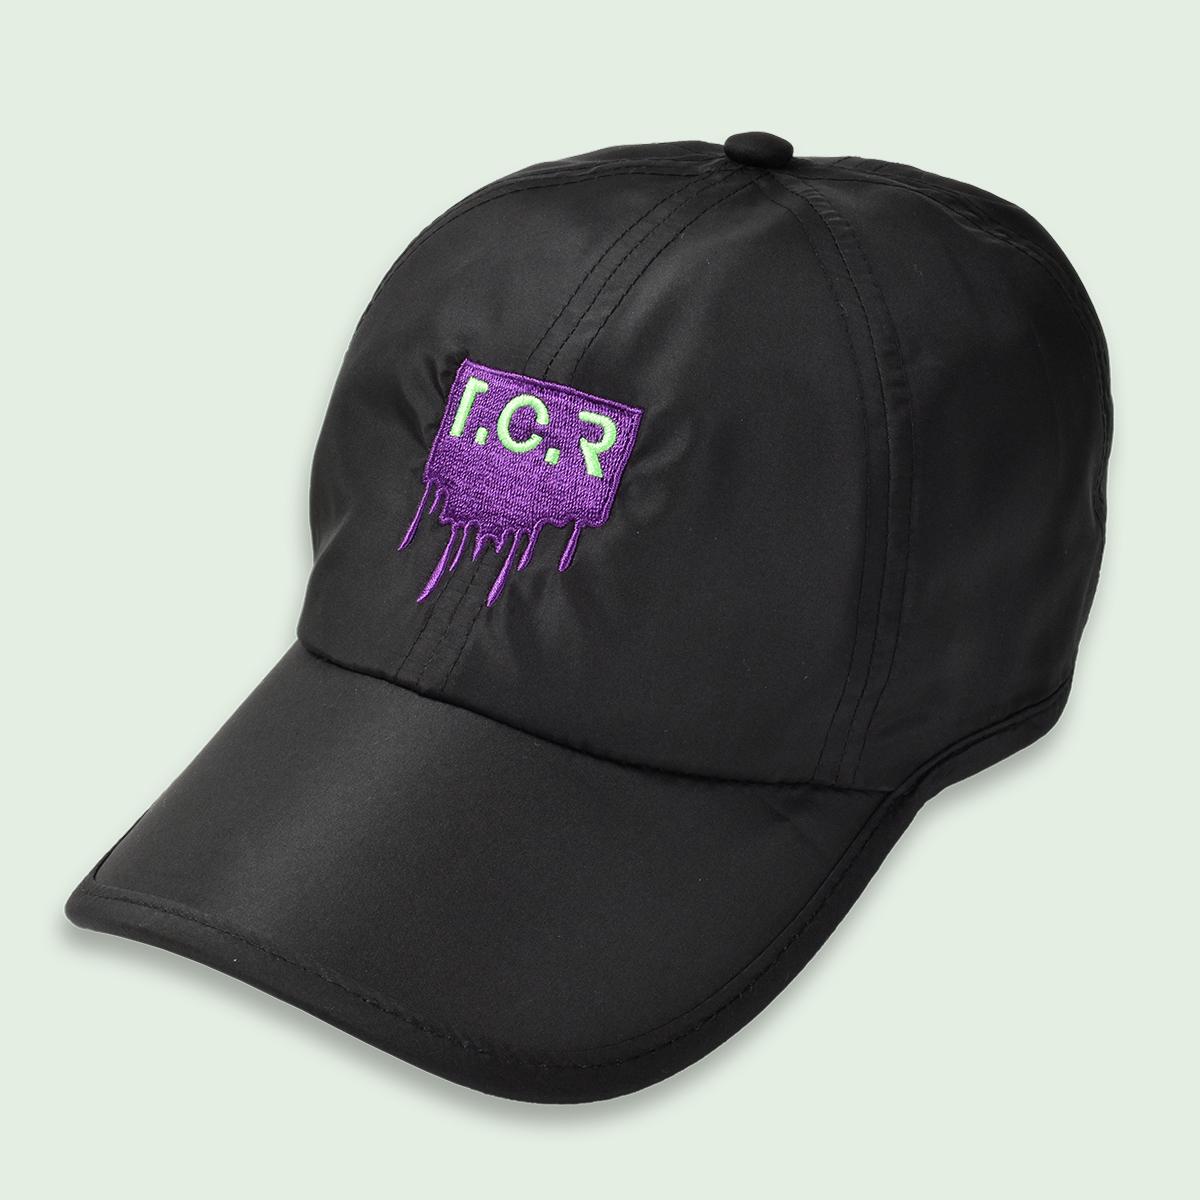 T.C.R SHELL 6-PANEL CAP - BLACK